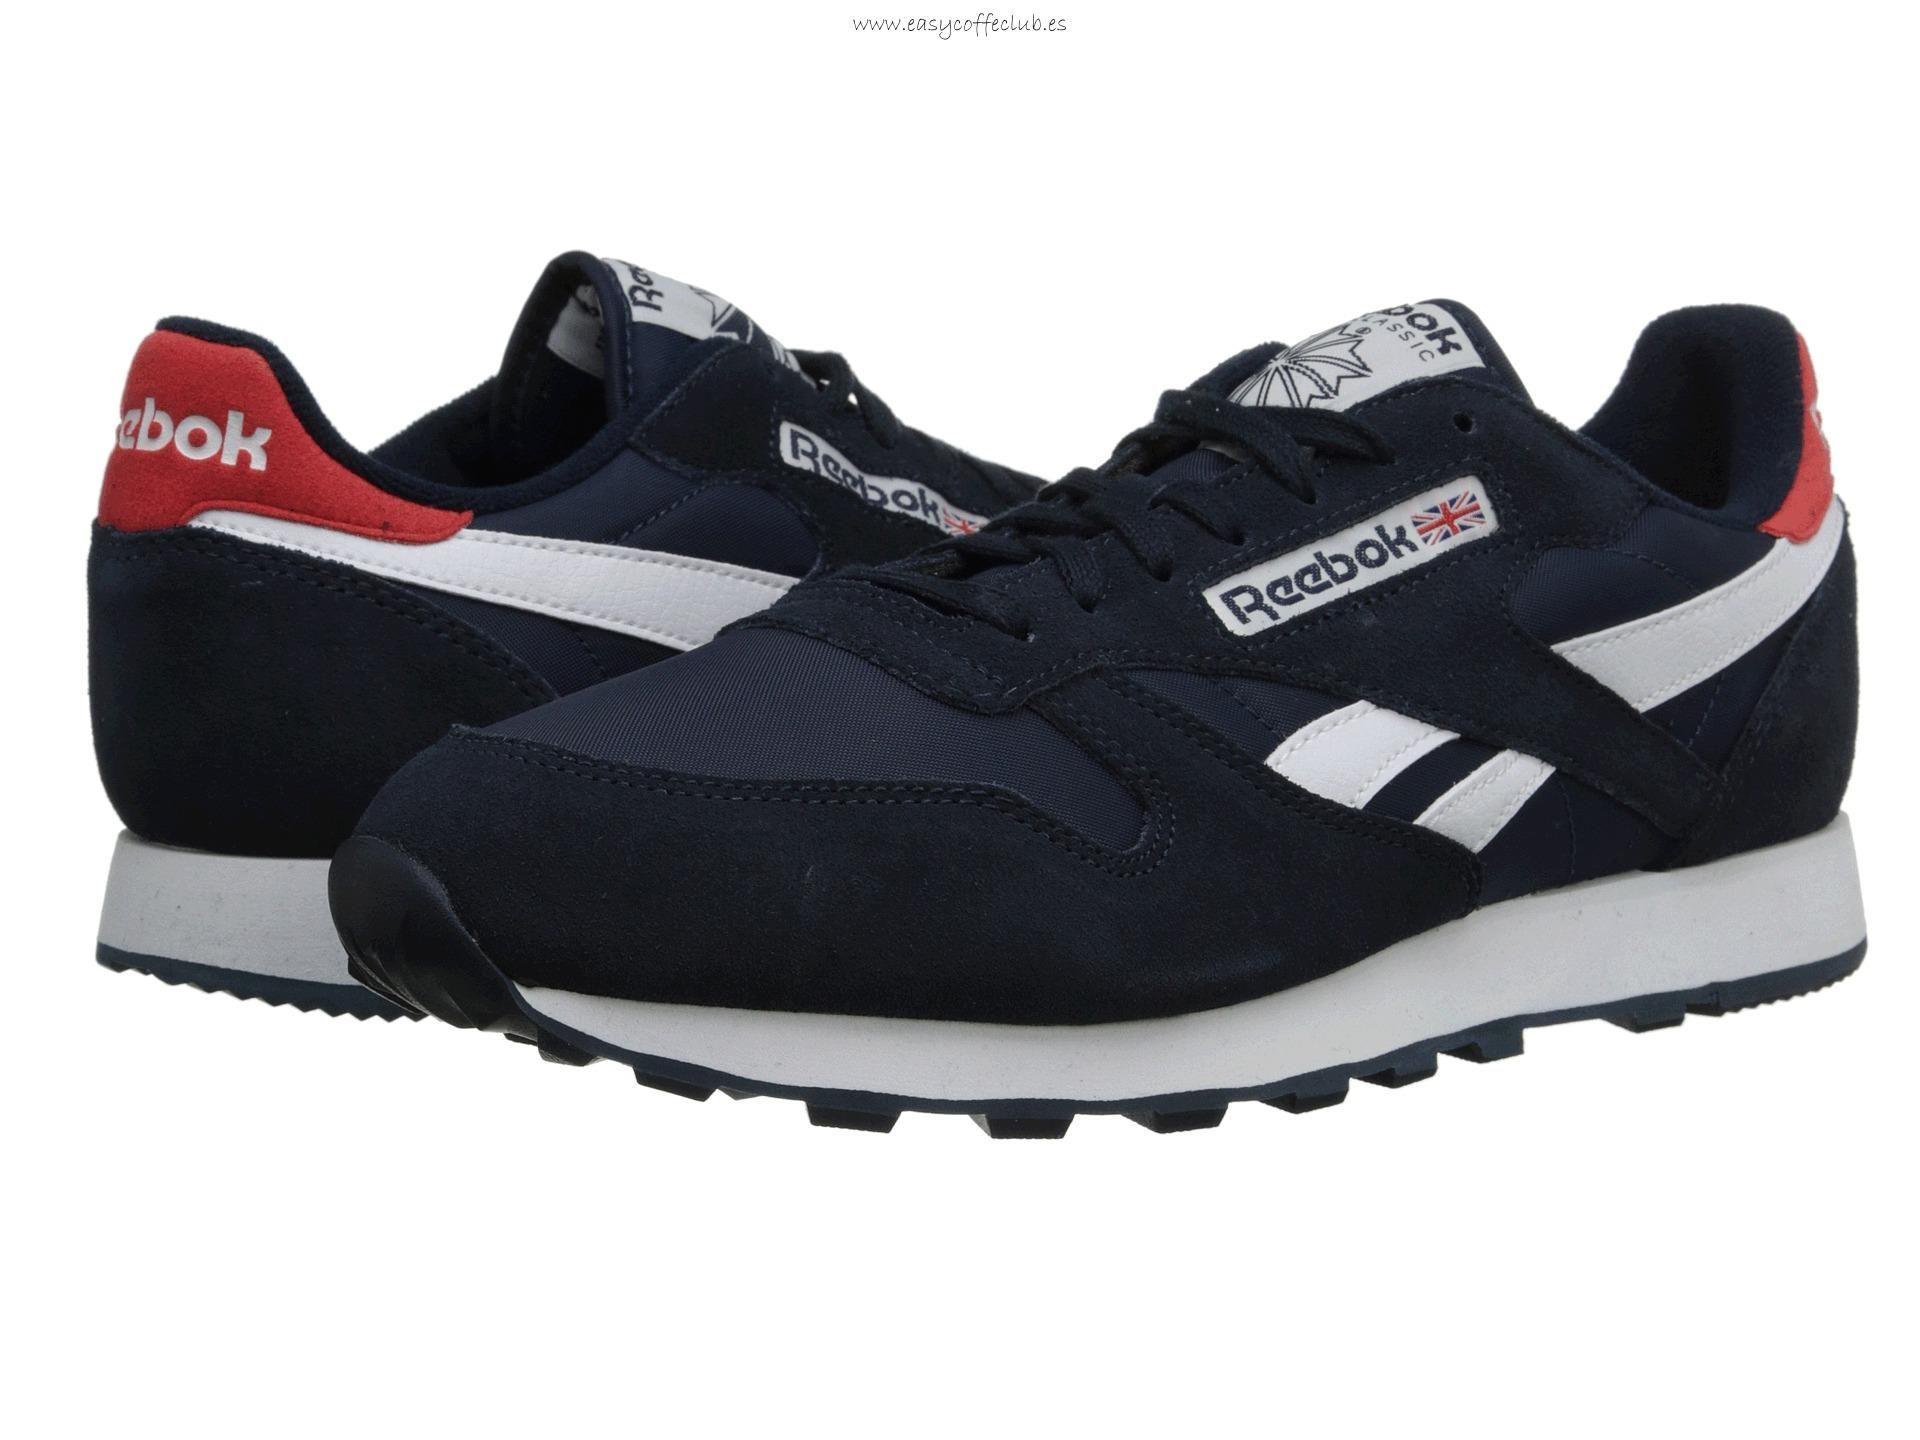 Reebok Para Hombrehombremodelos De Zapatos Modelos CExBeWrdoQ